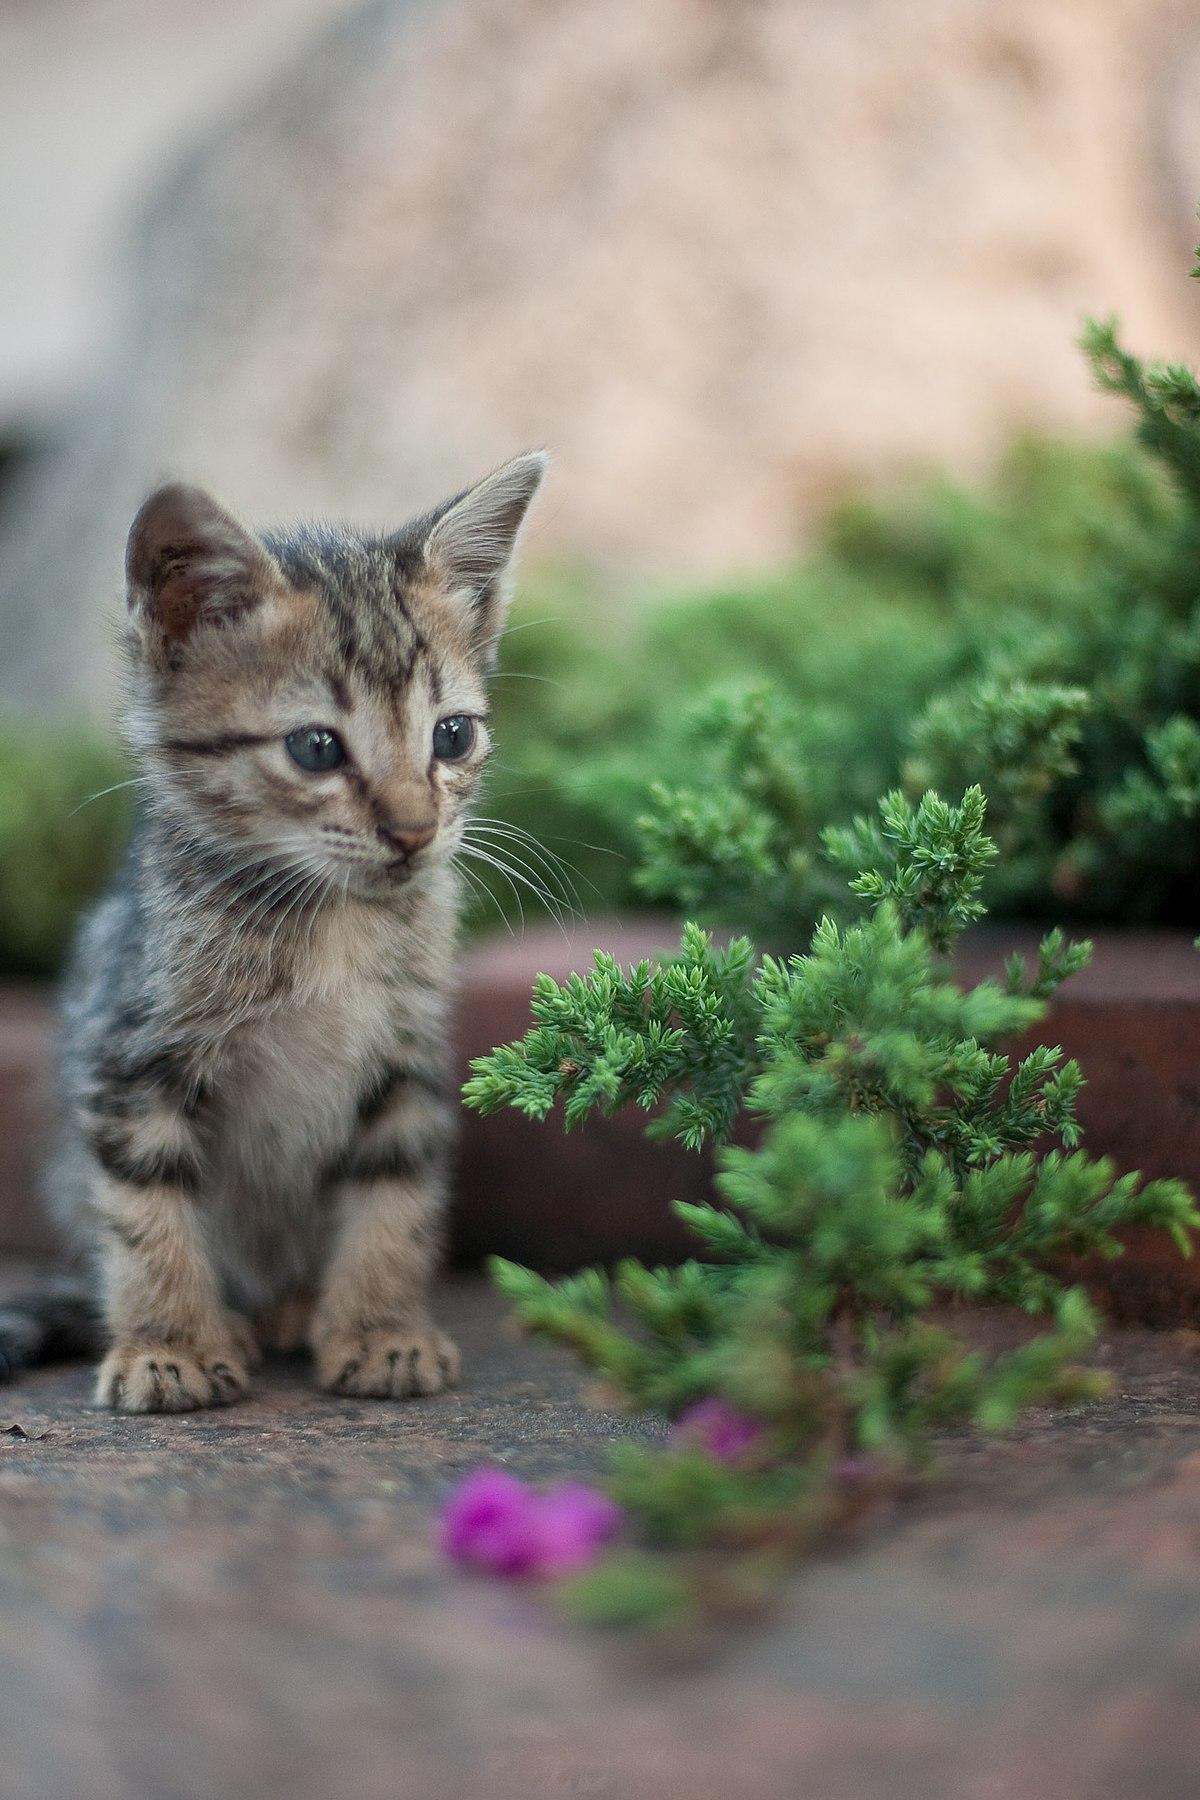 Nama Kucing Yg Bagus : kucing, bagus, Kucing, Wikipedia, Bahasa, Indonesia,, Ensiklopedia, Bebas